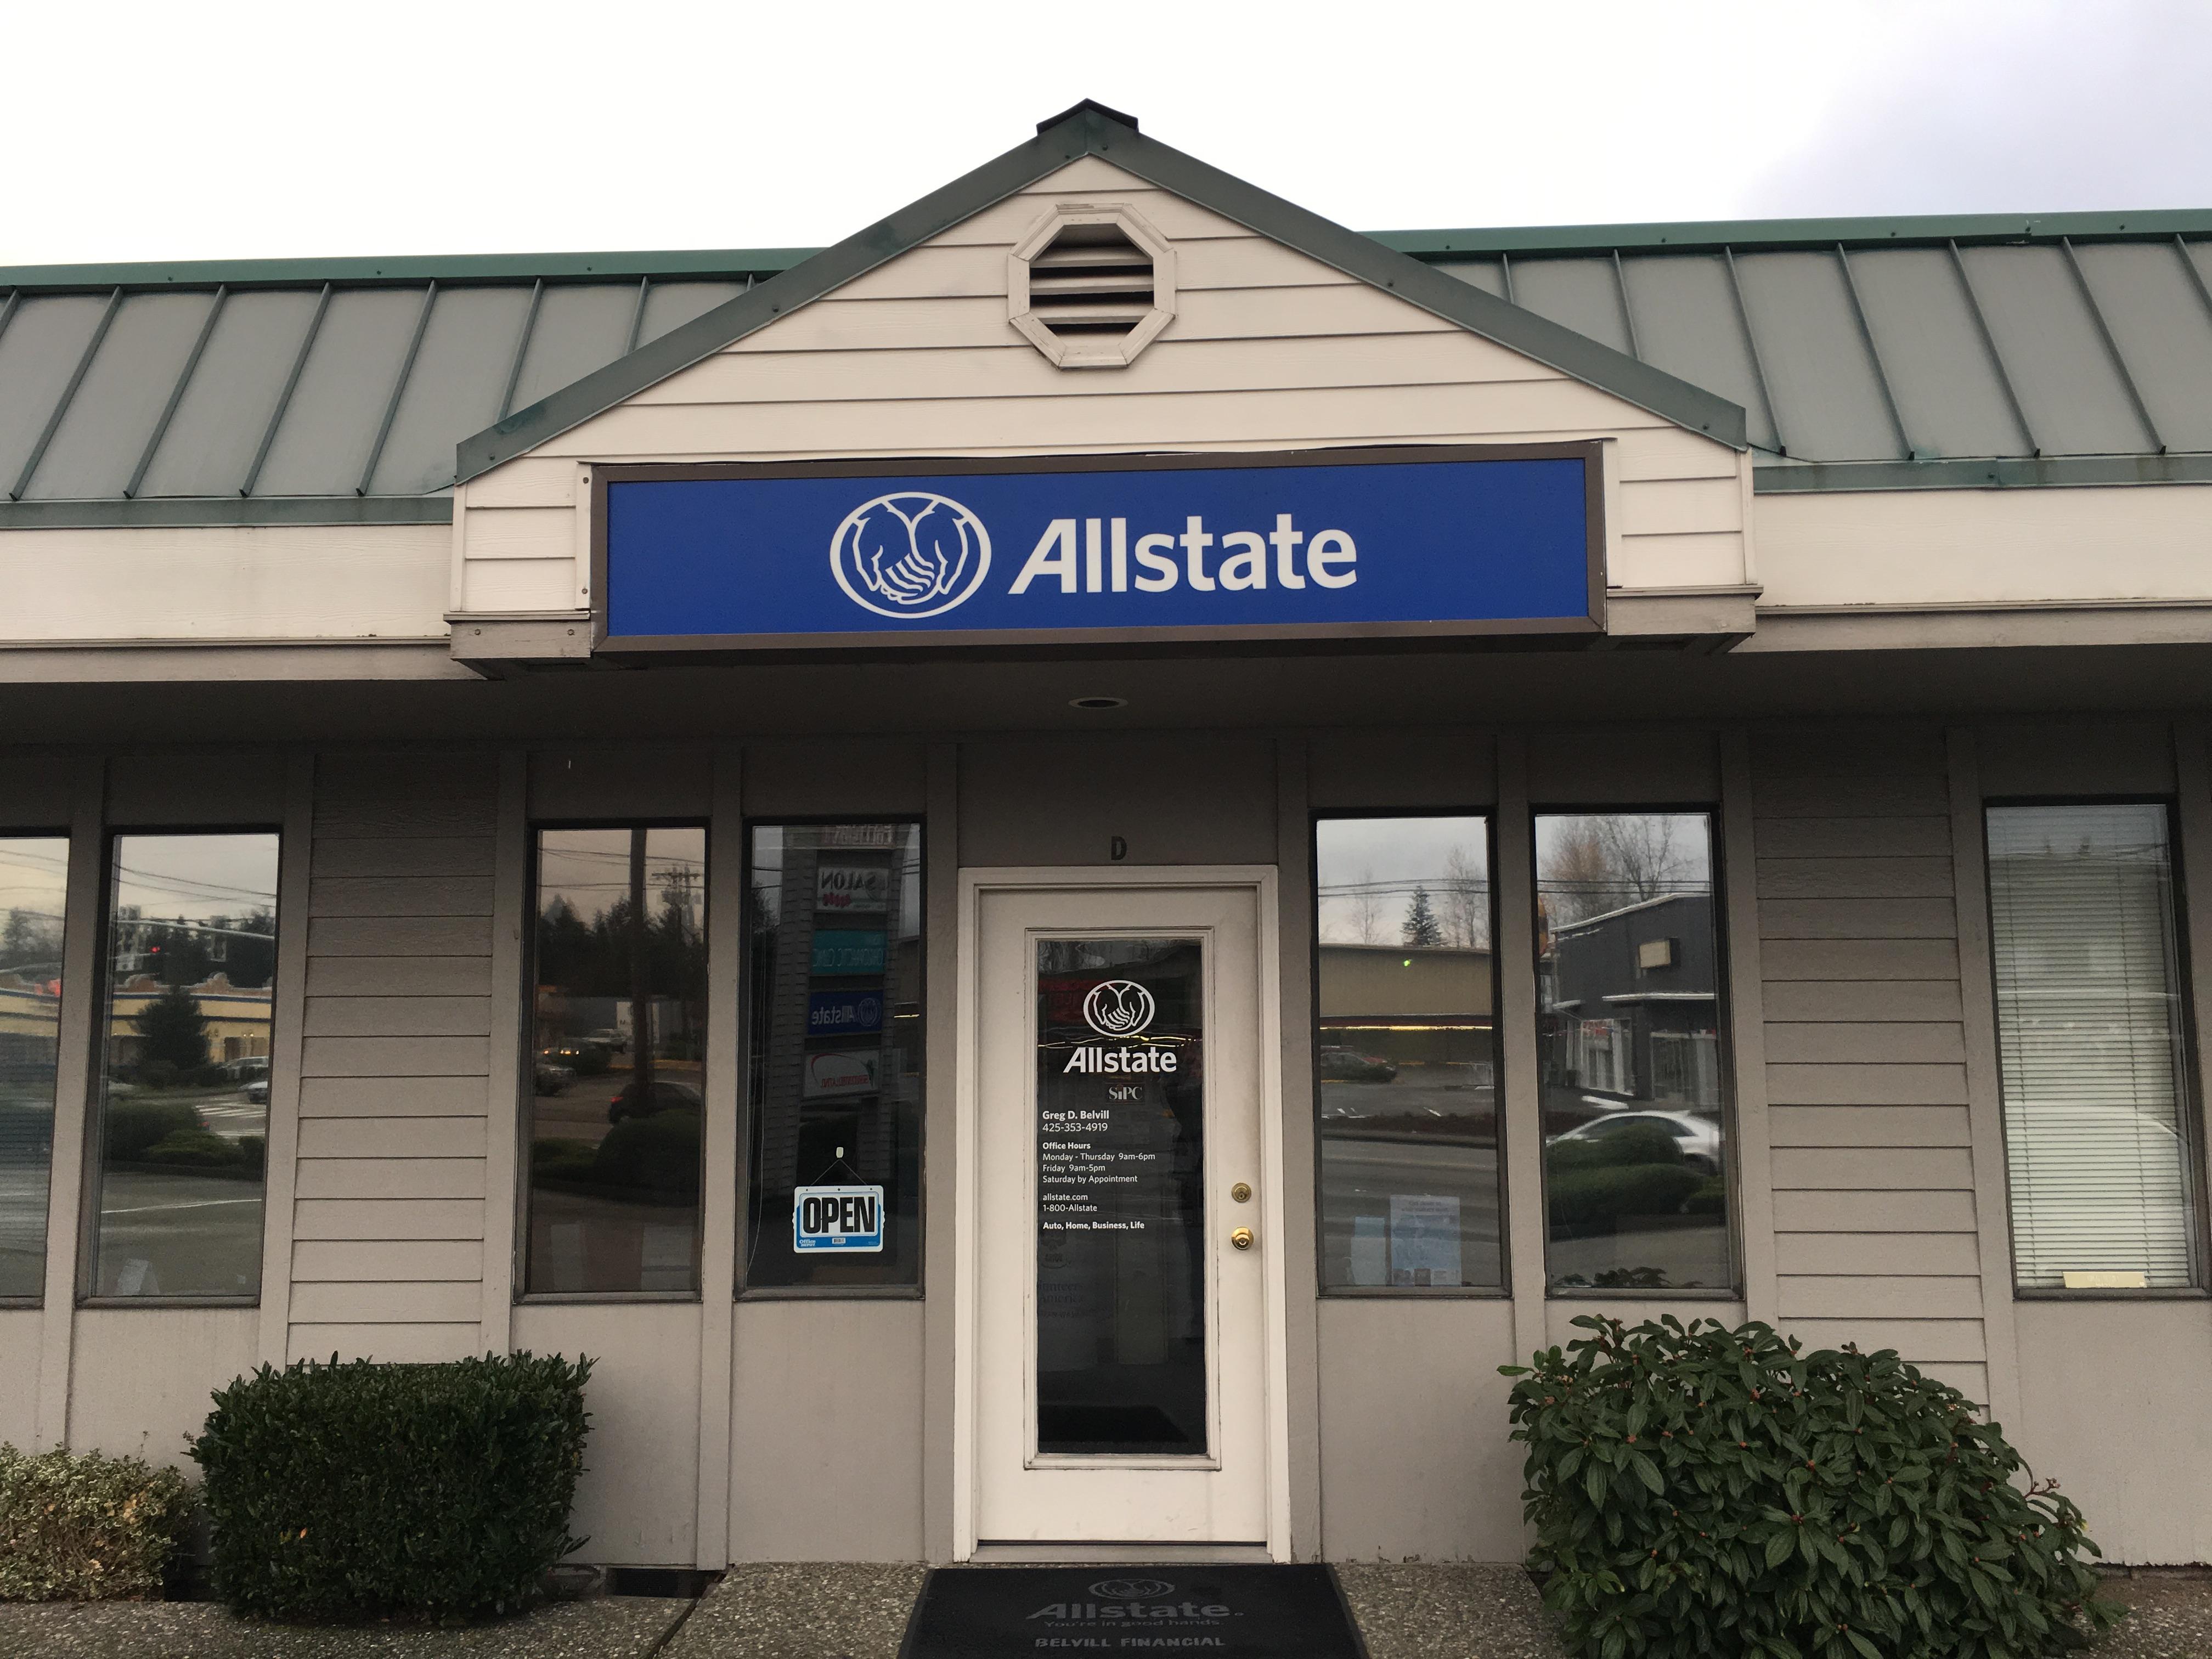 Greg D. Belvill: Allstate Insurance image 1